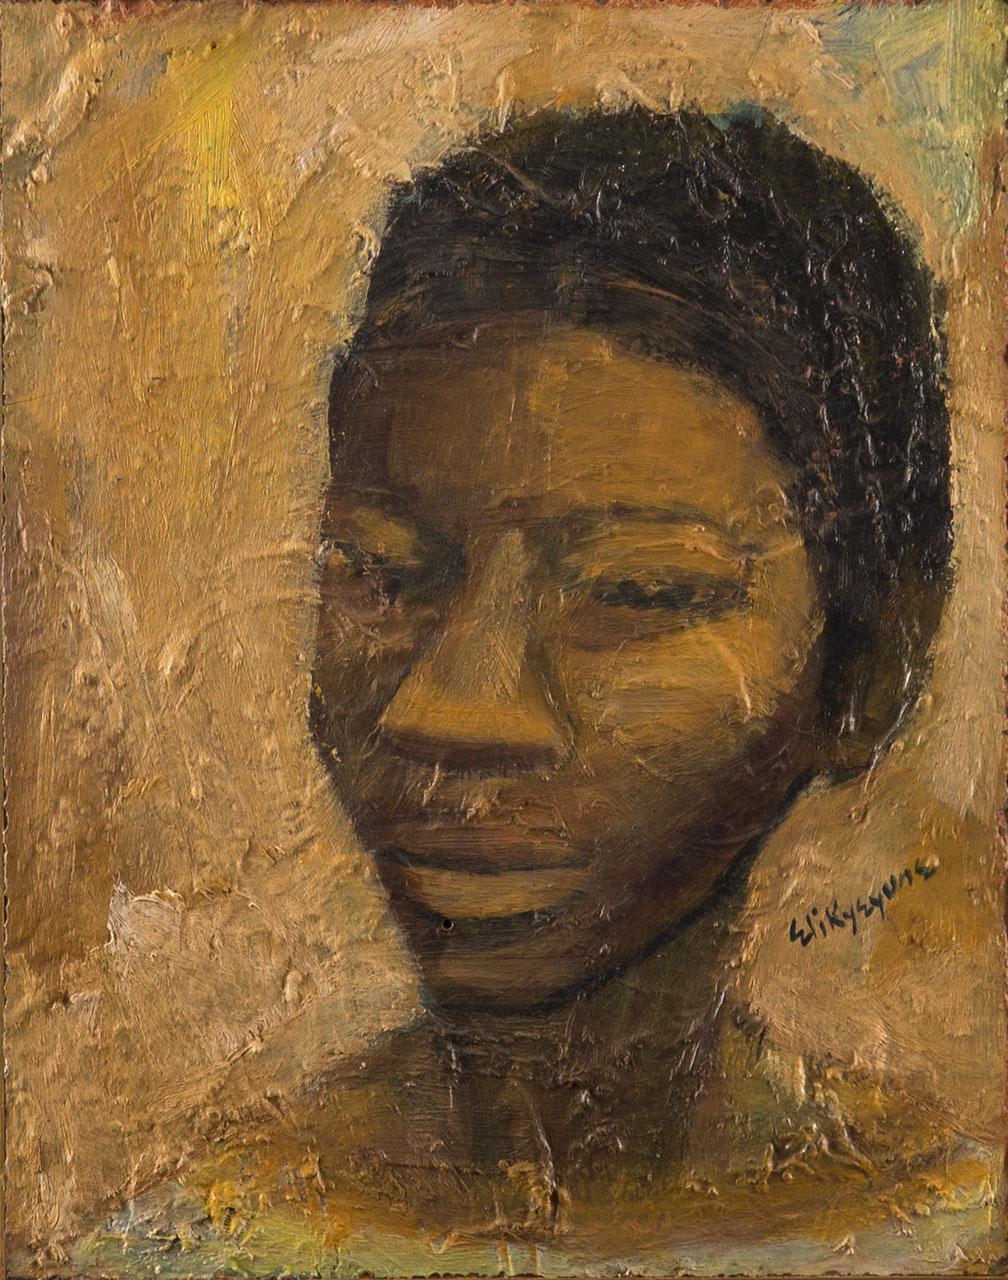 Eli Kyeyune (b.1936), Portrait , 1975, oil on hardboard,36 x 28 cm